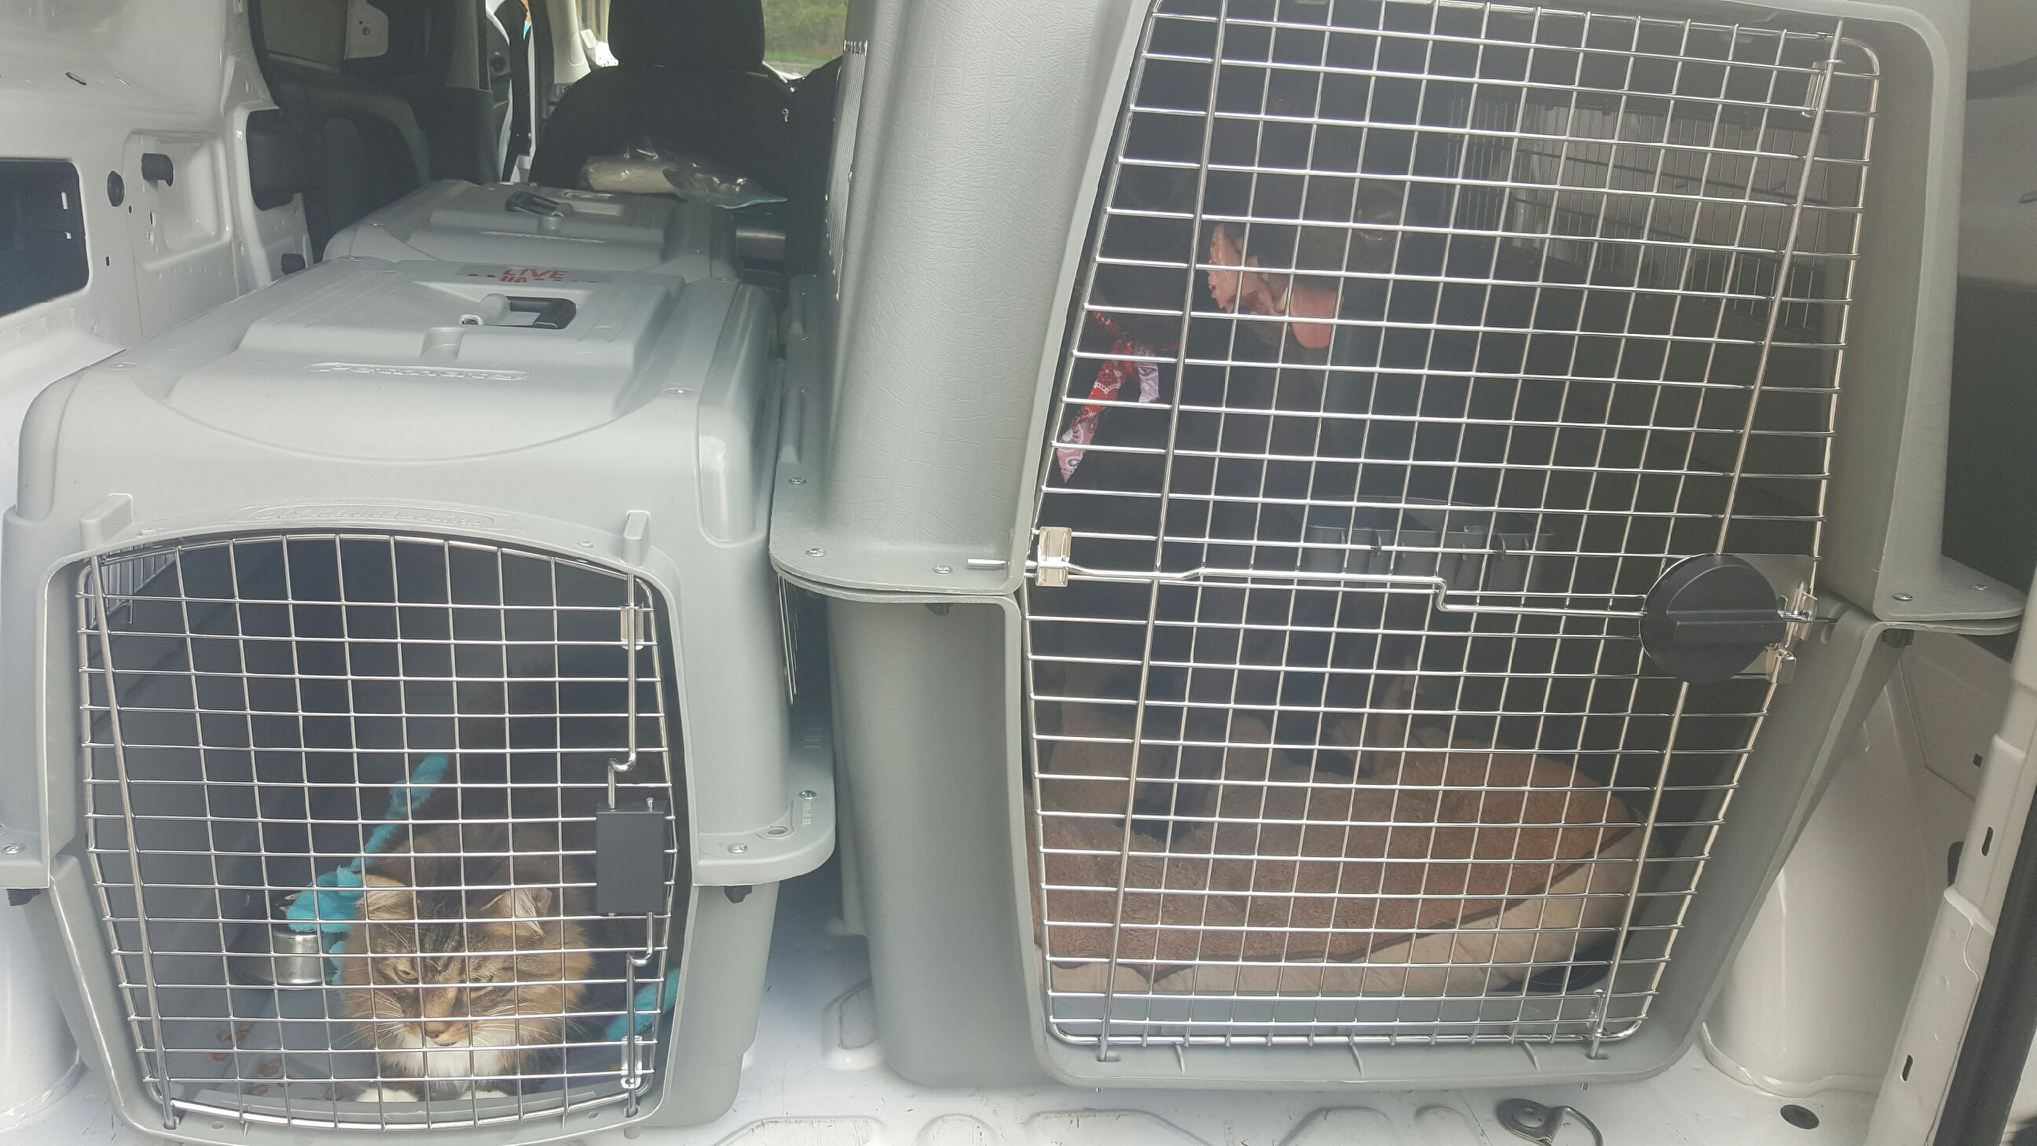 Unhappy Animals in the SWURV